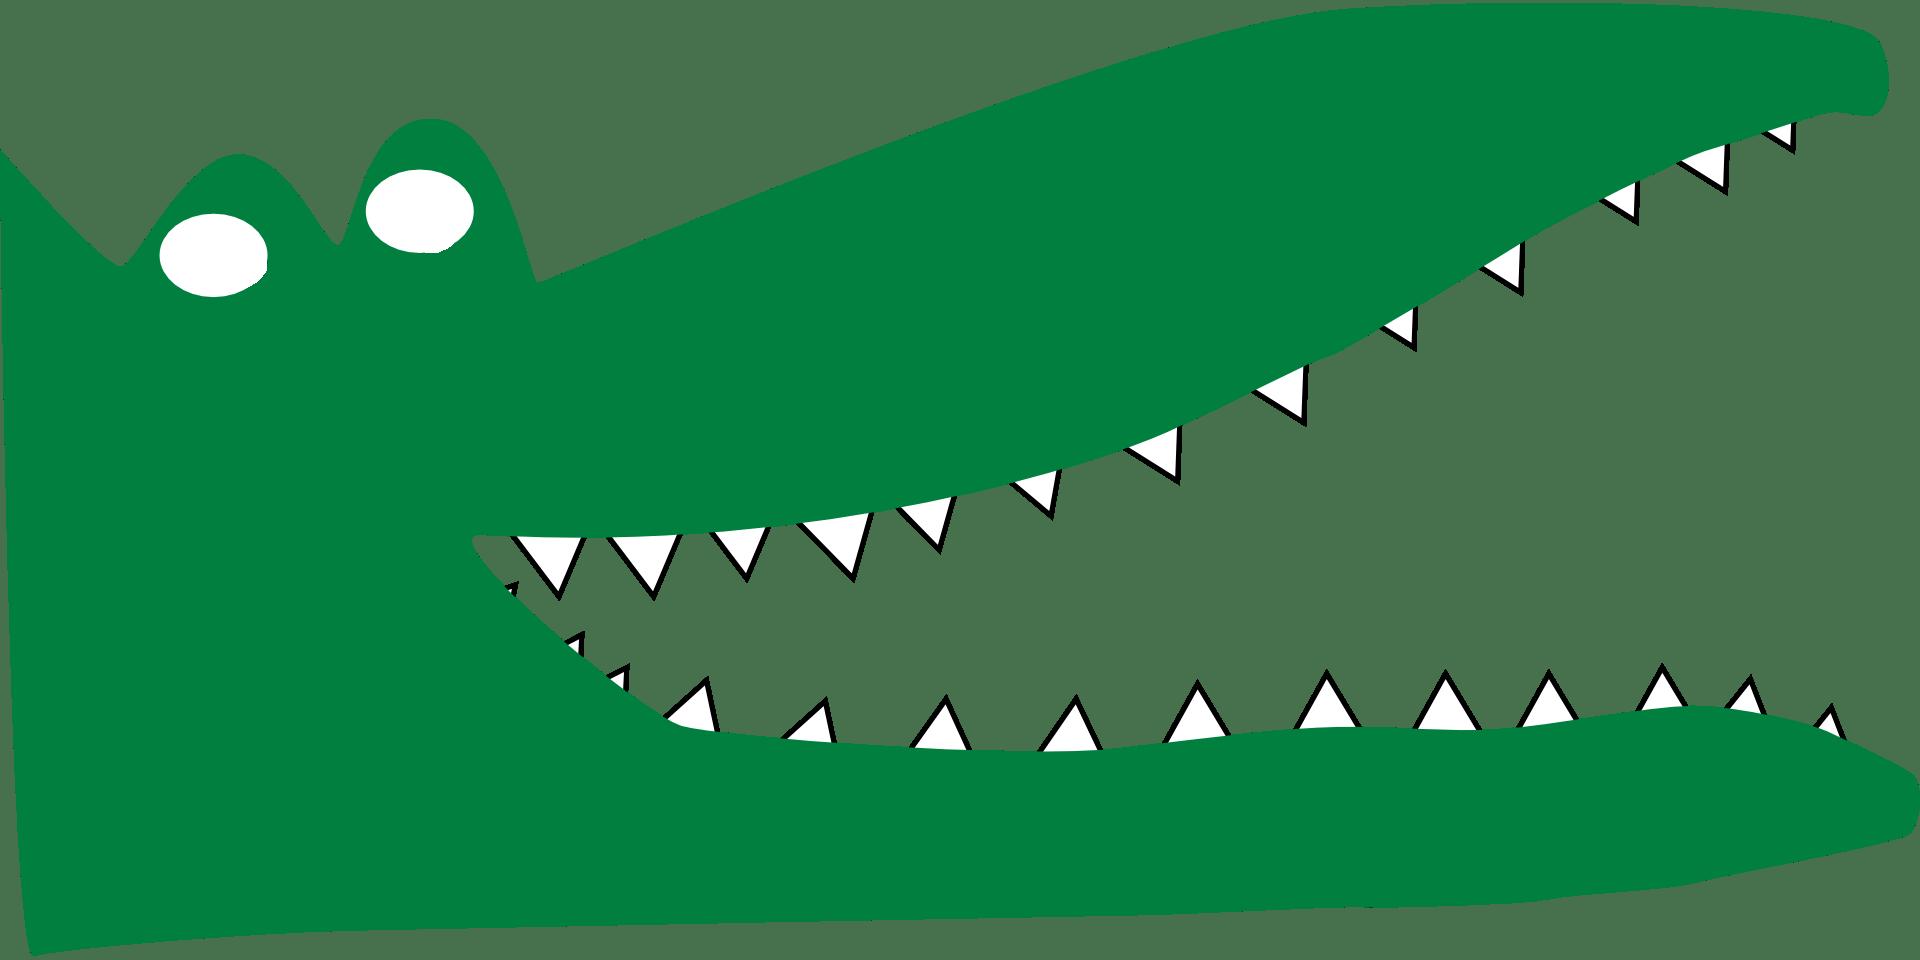 Clipart mouth alligator. Cartoon open